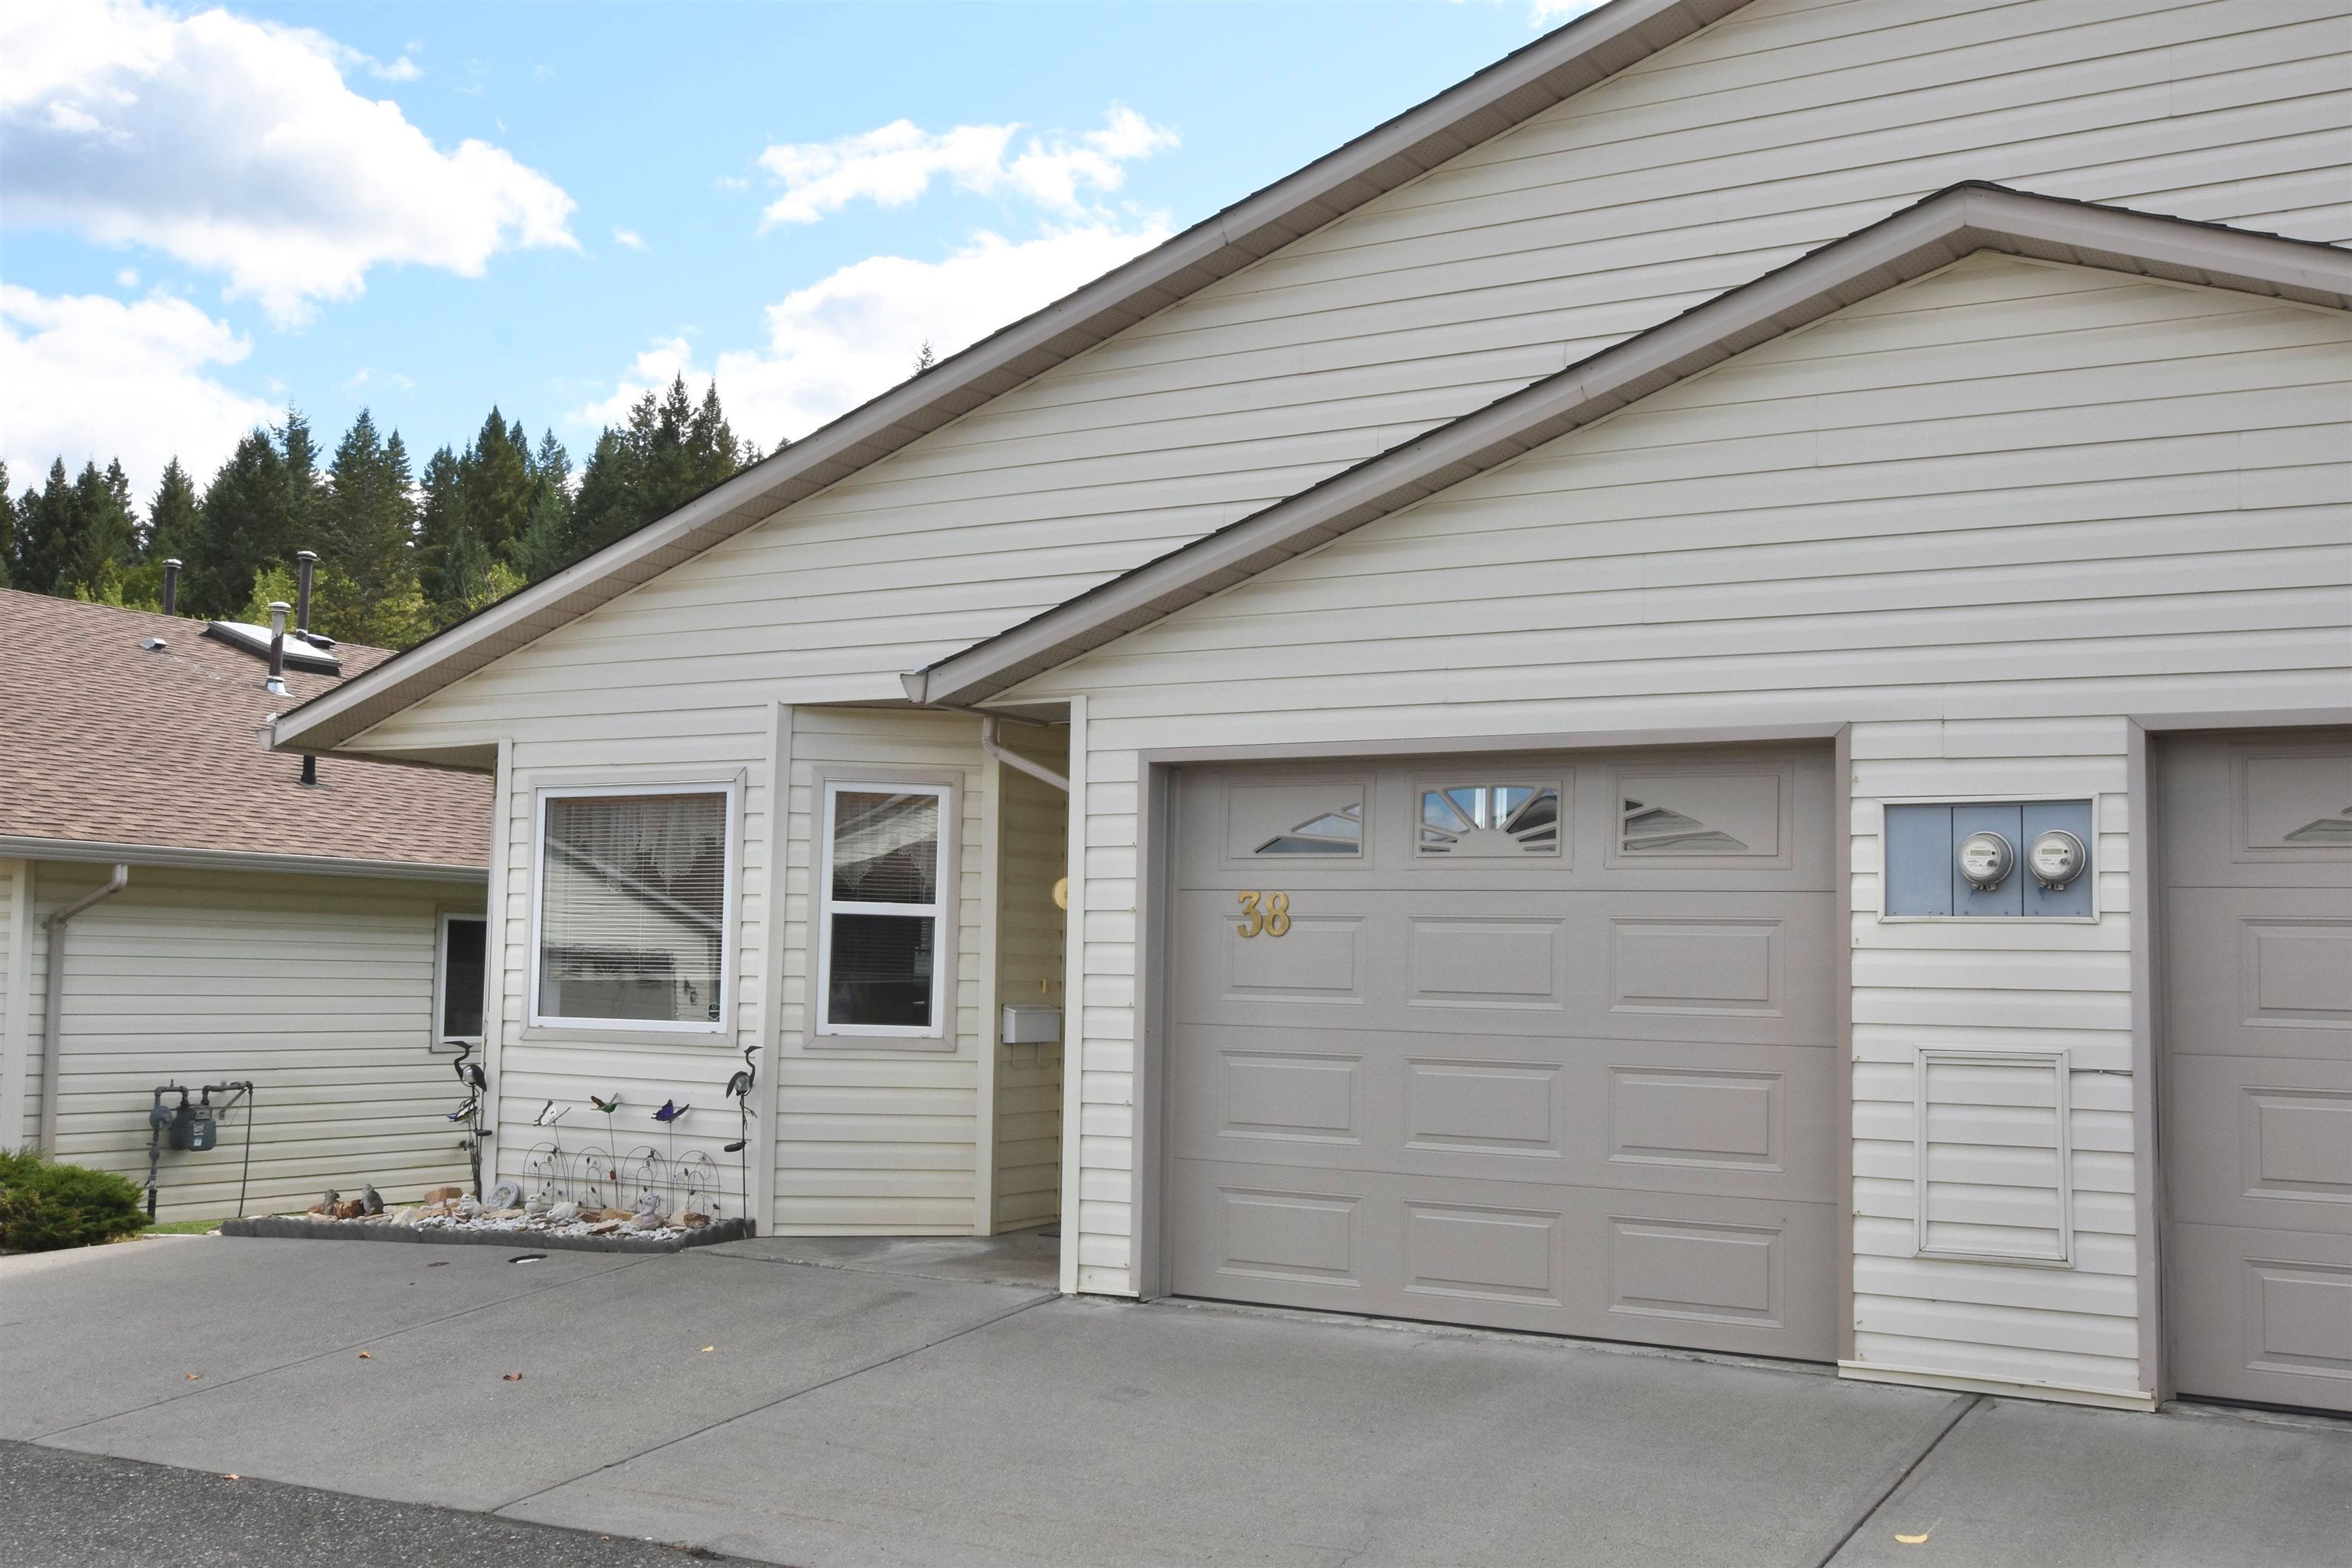 Main Photo: 38 500 WOTZKE Drive in Williams Lake: Williams Lake - City Townhouse for sale (Williams Lake (Zone 27))  : MLS®# R2618270